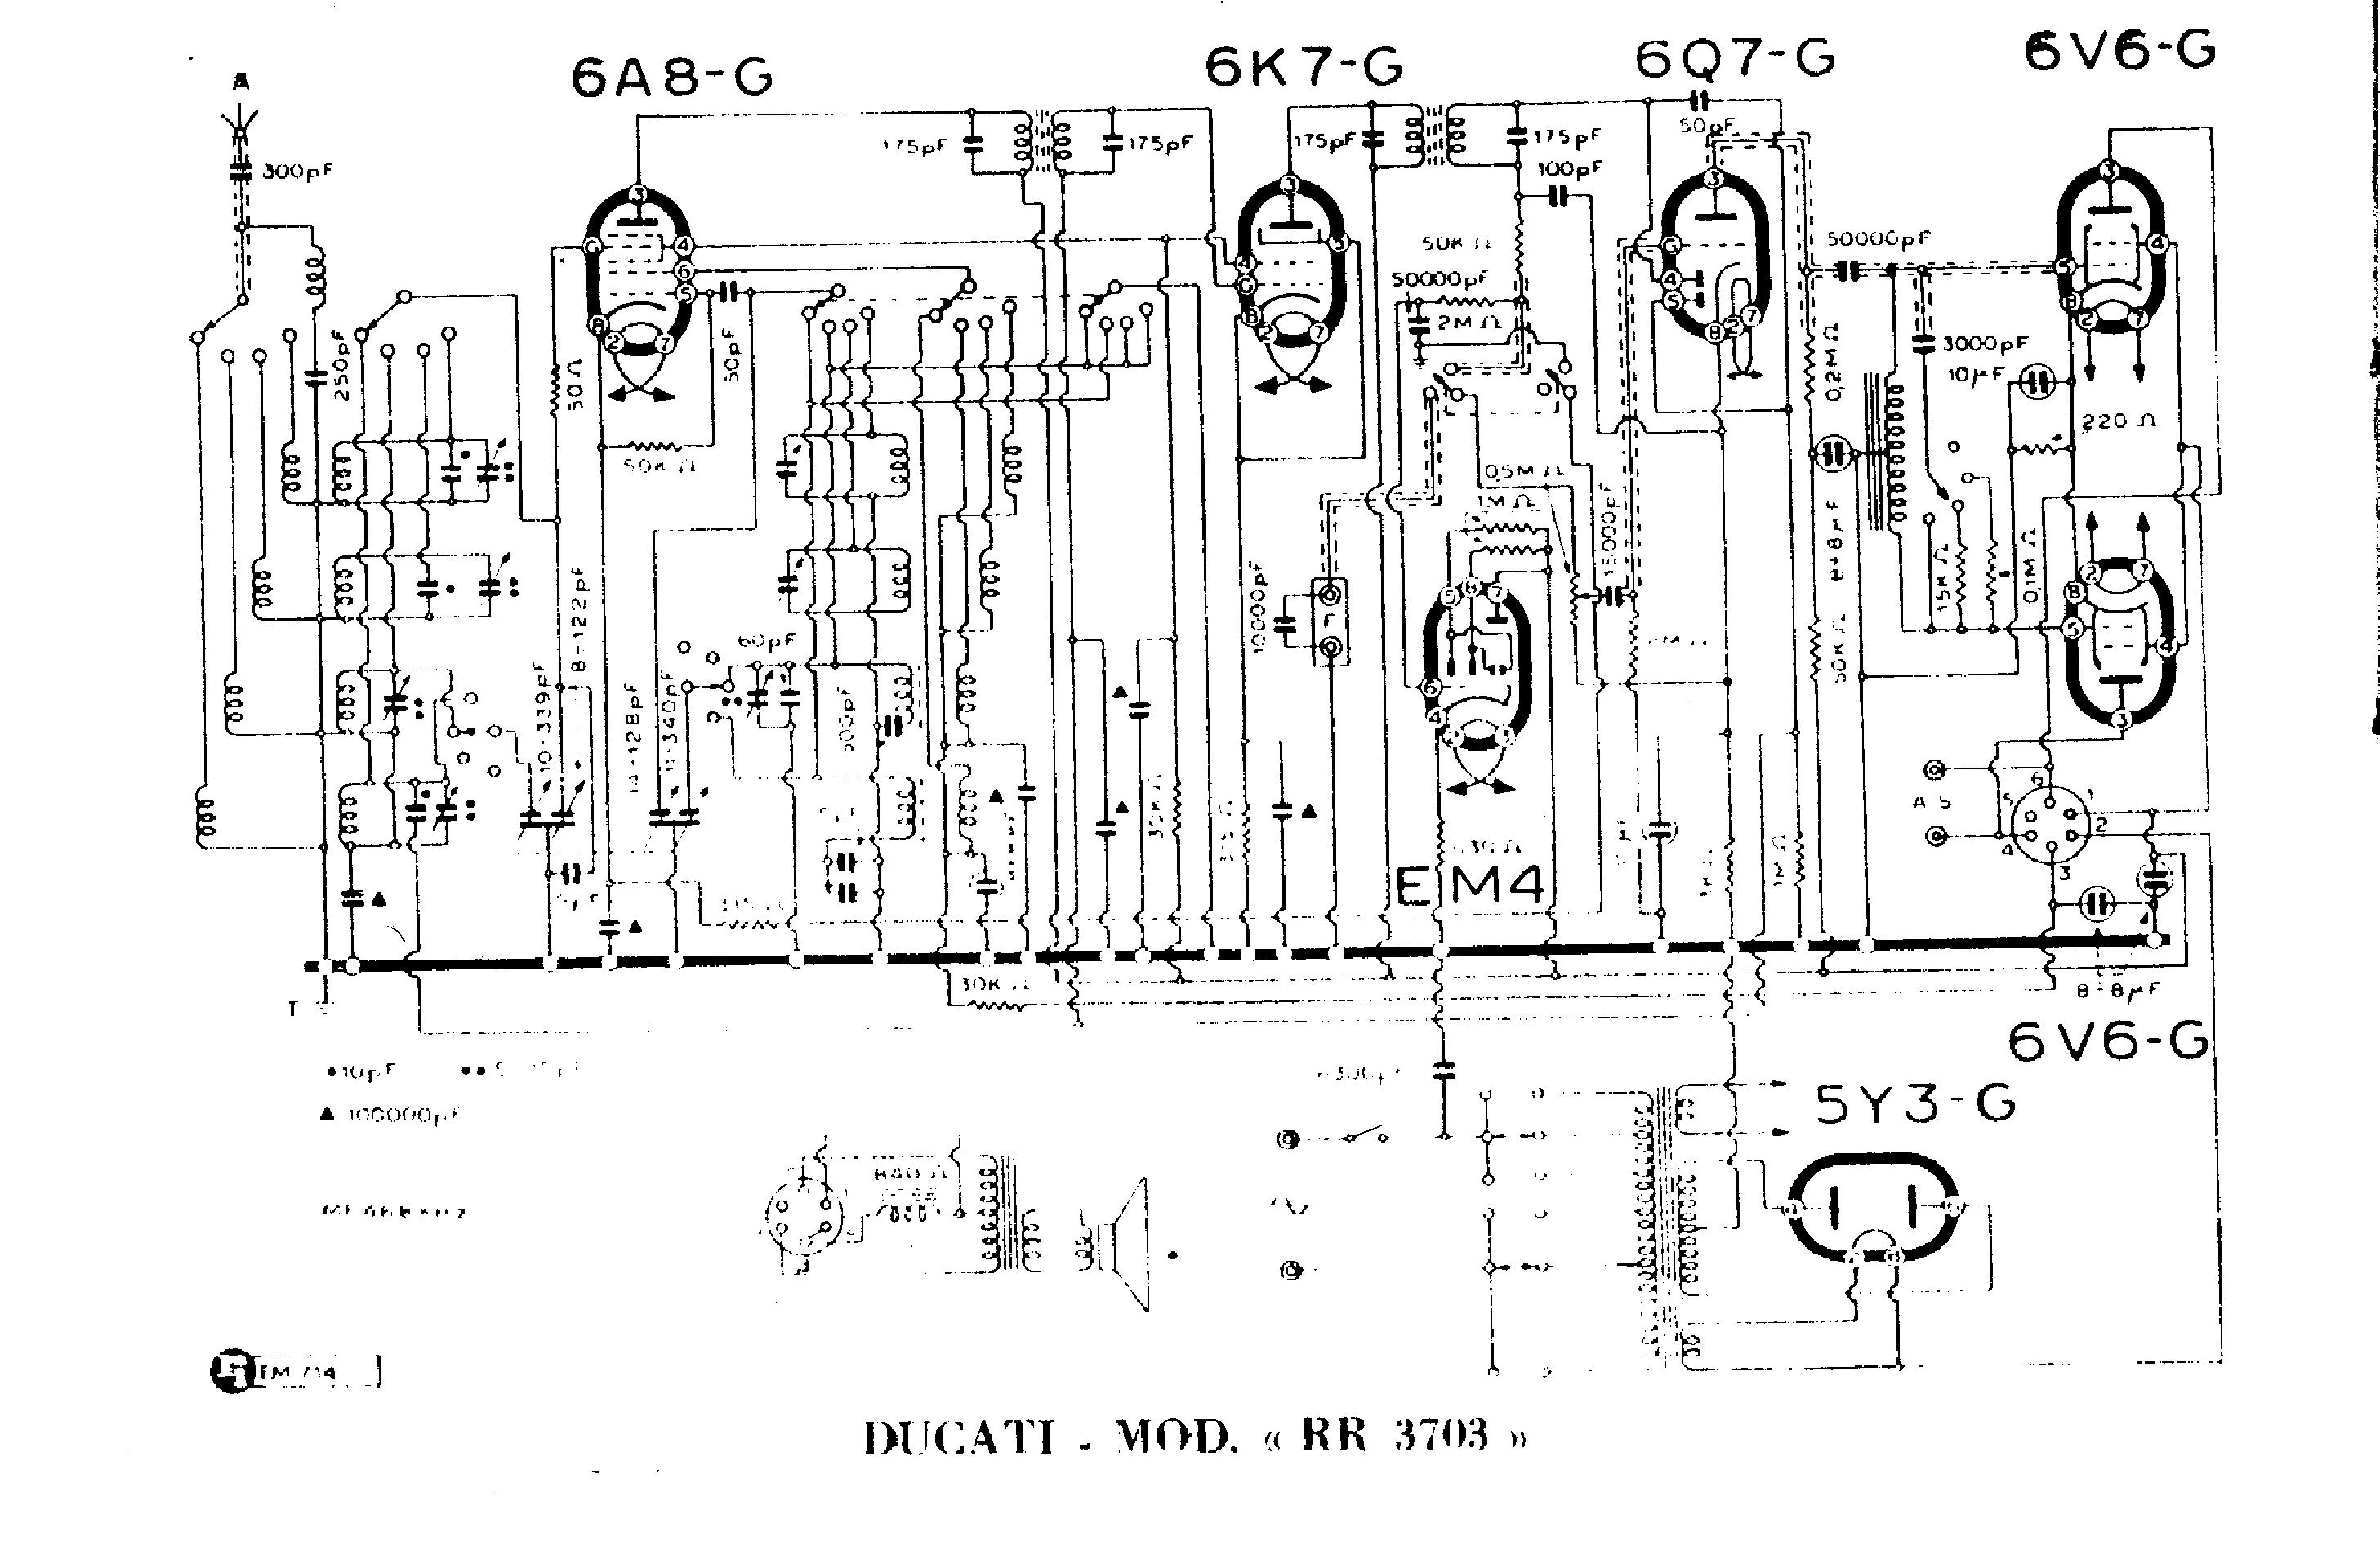 ducati rr3703 sch service manual download  schematics